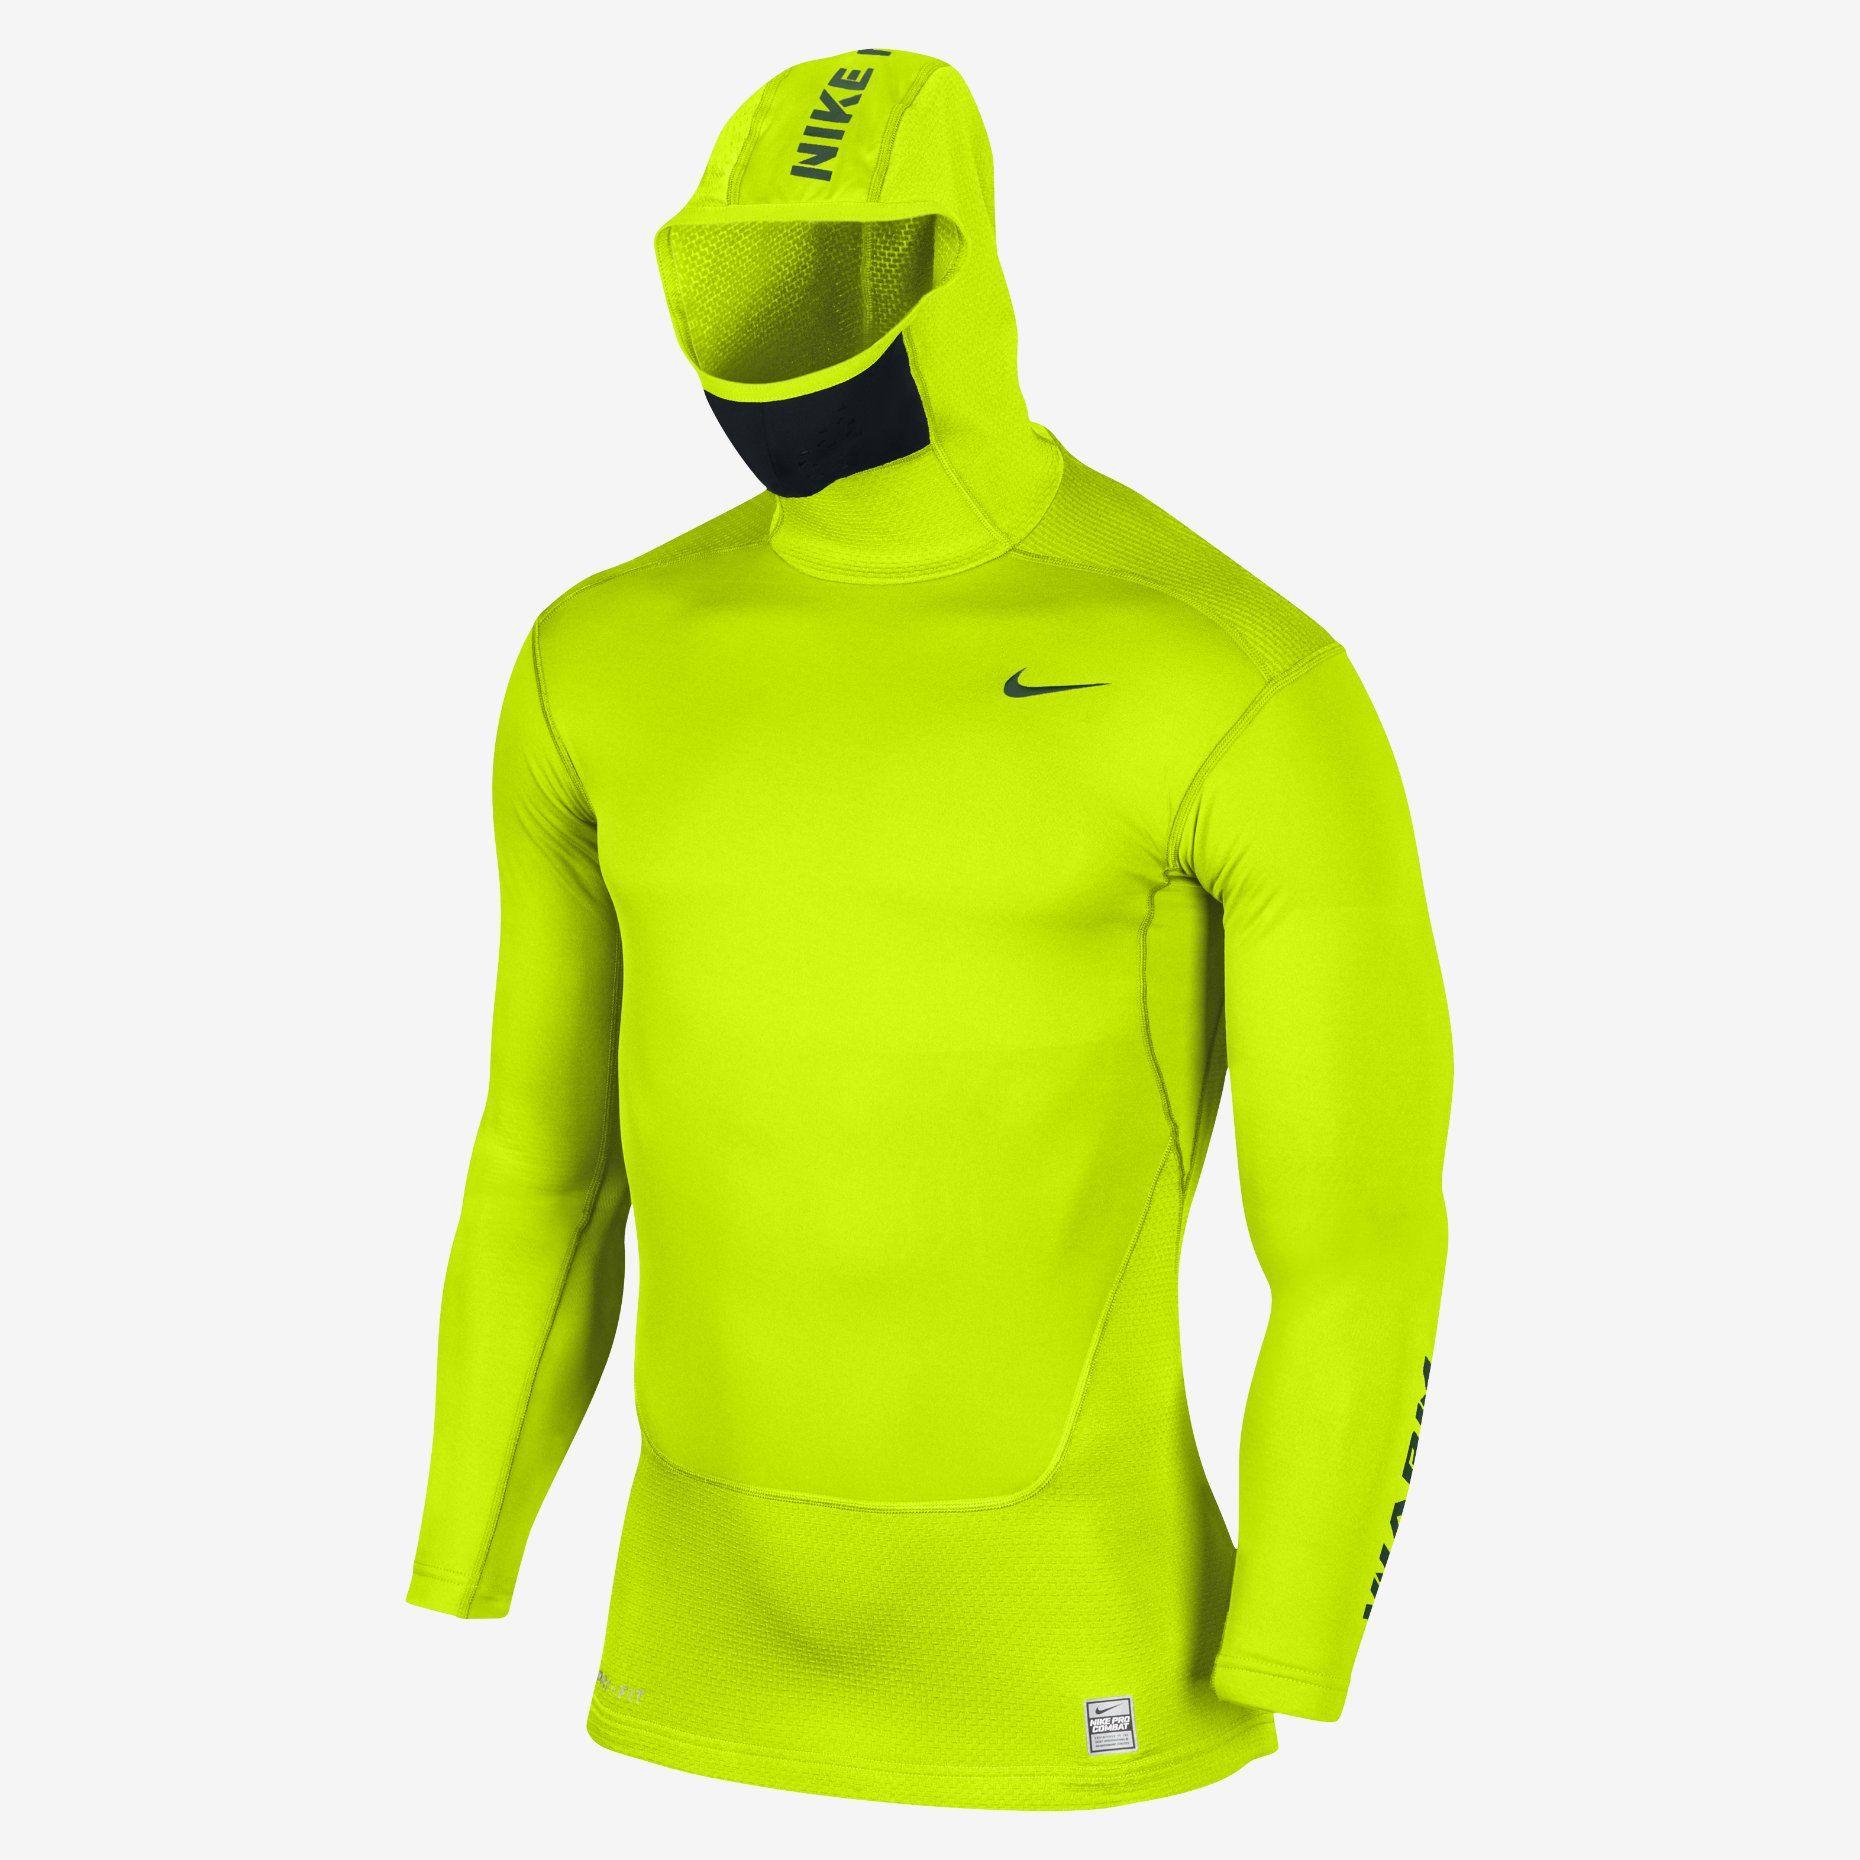 Nike Store Nike Pro Combat Hyperwarm Dri Fit Max Shield Men S Hoodie Nike Pro Combat Hoodies Men Nike Cycling [ 1860 x 1860 Pixel ]